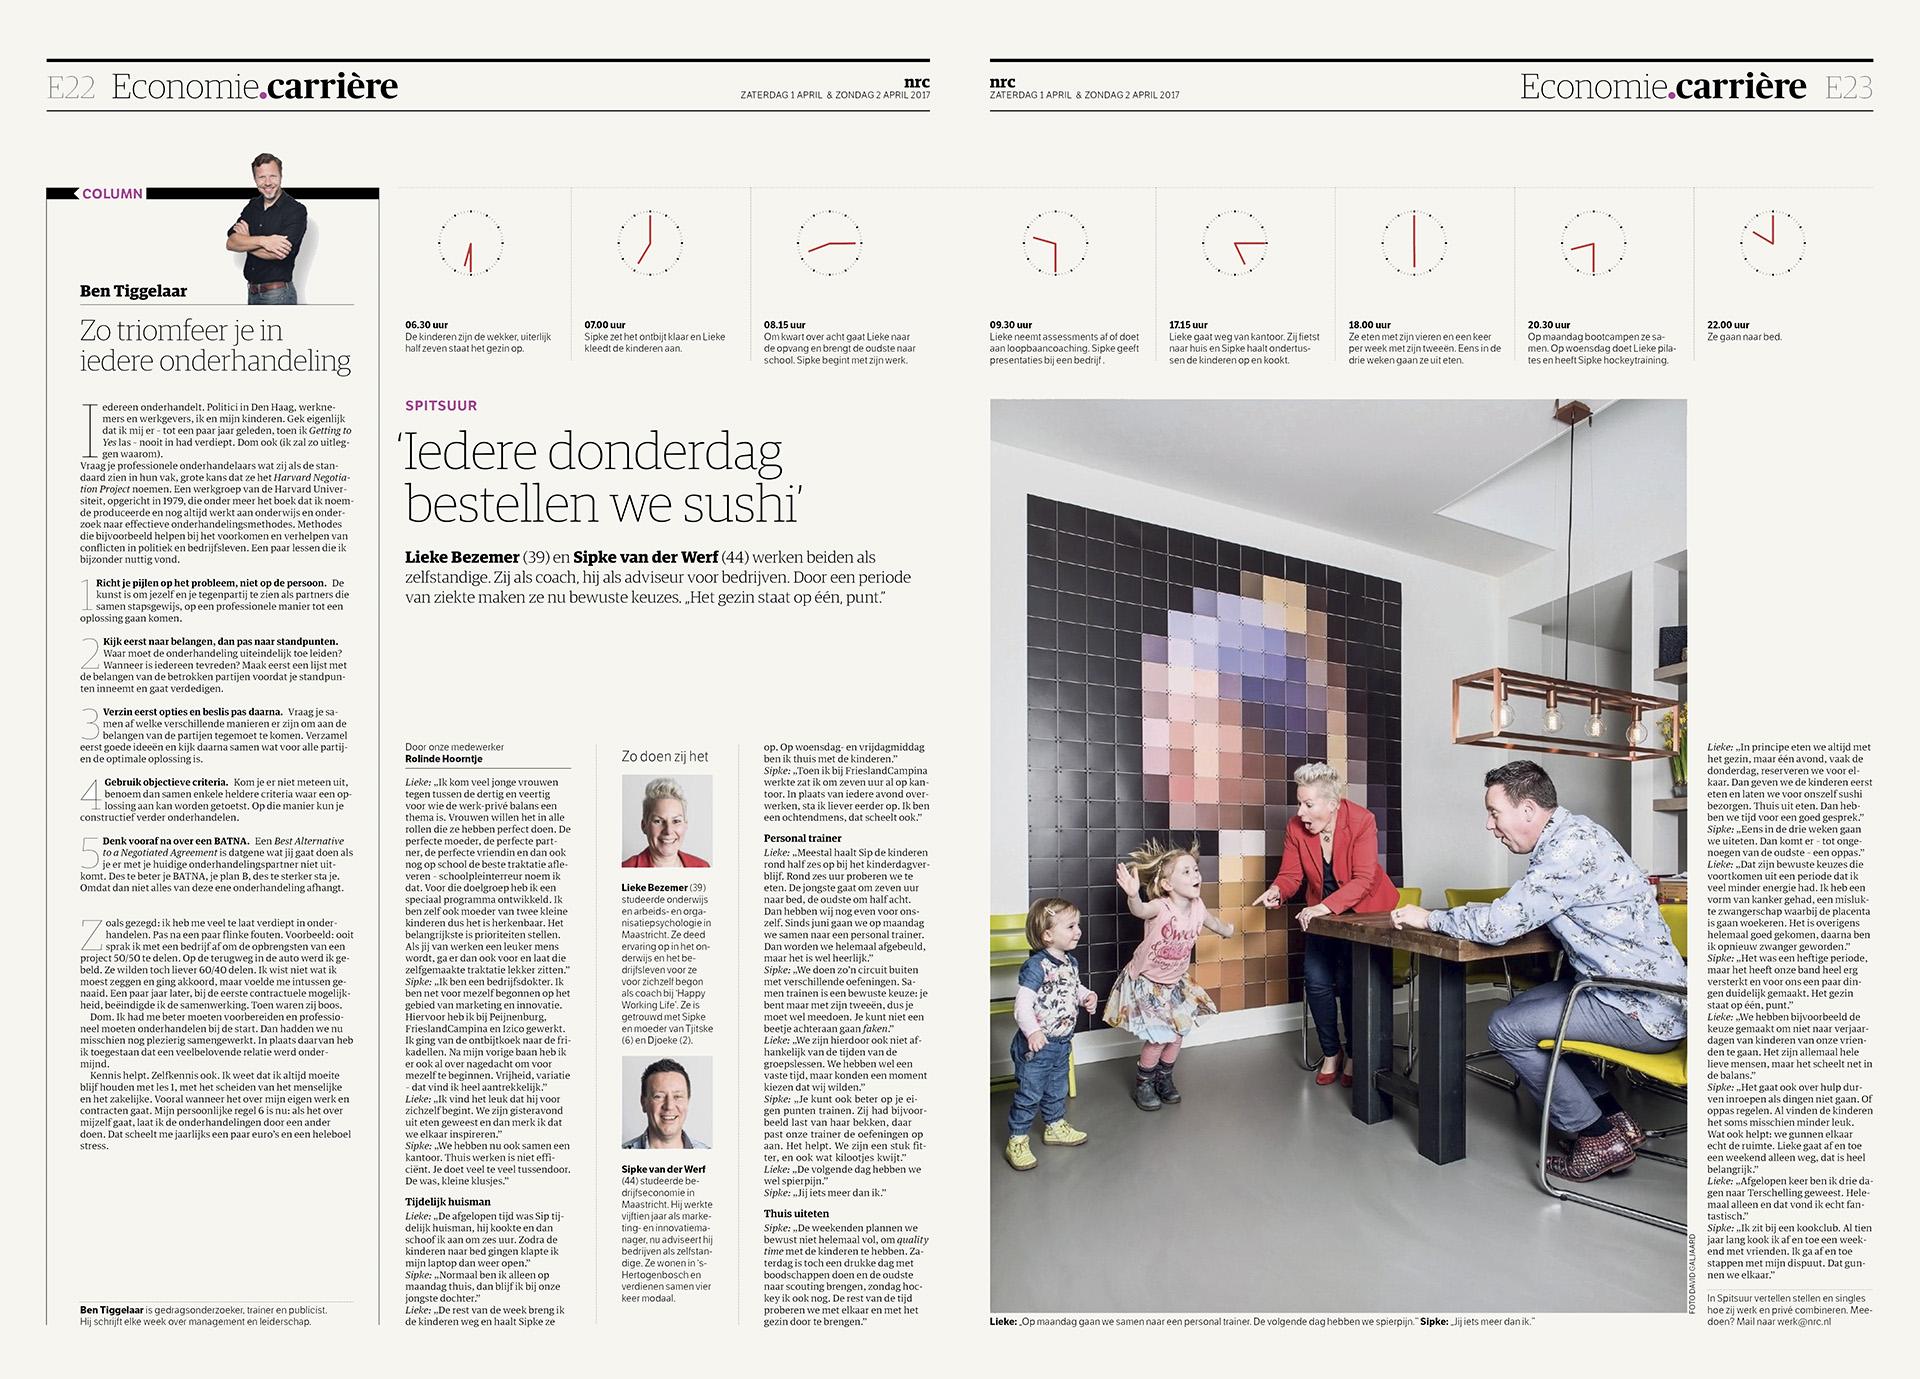 NRC Handelsblad - Economie - Spitsuur - 2017 - David Galjaard